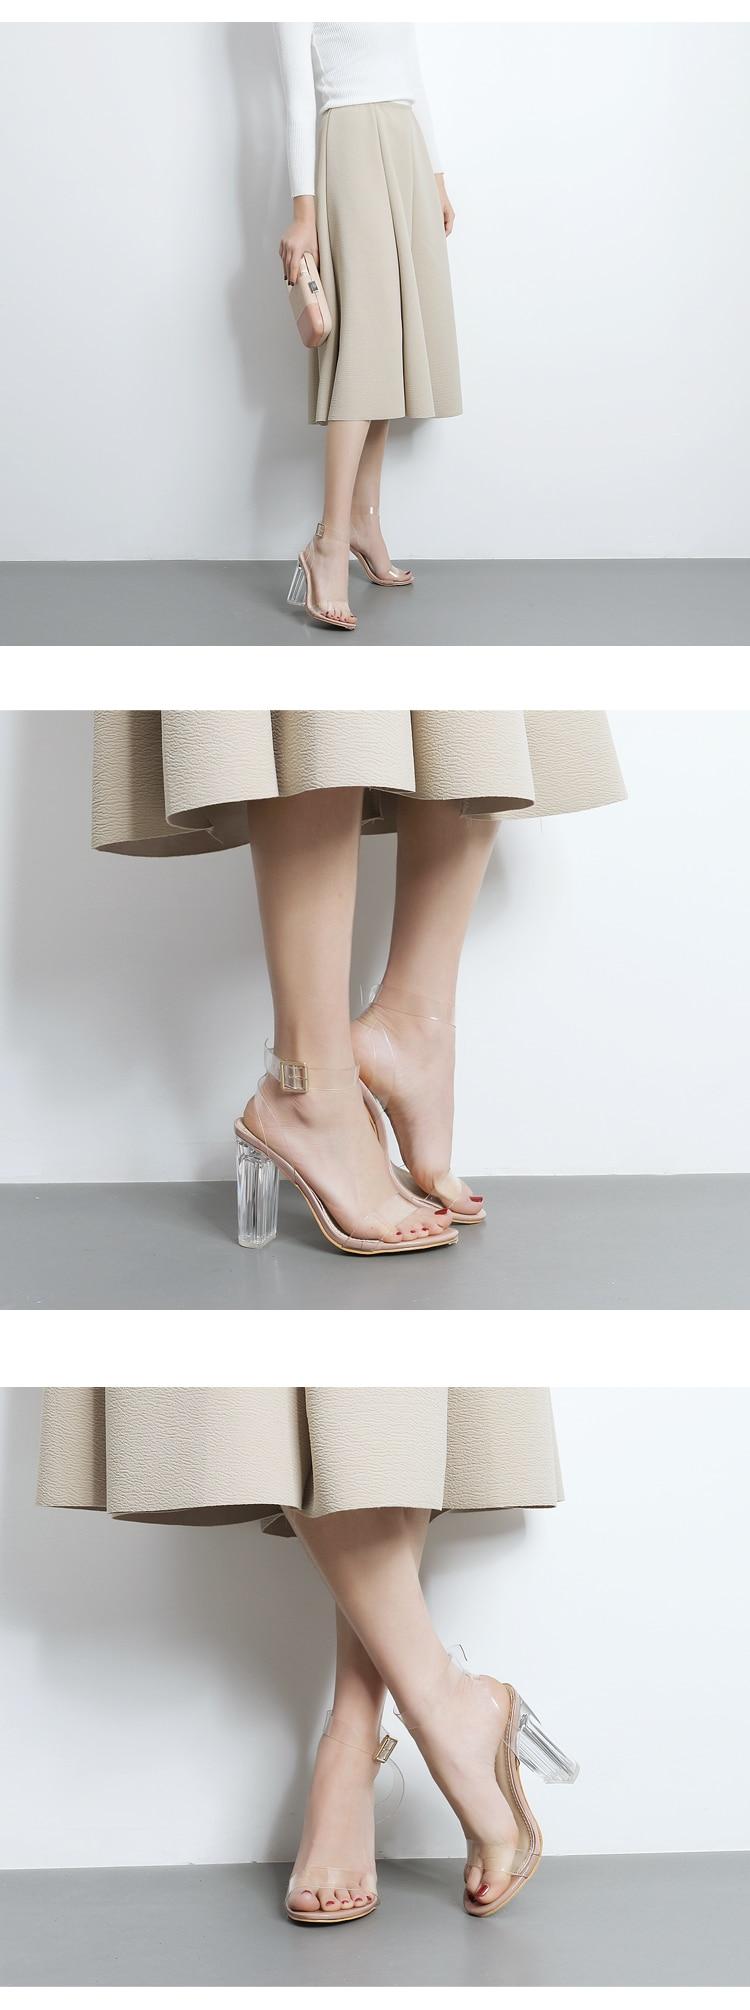 HTB1a88dXdfvK1RjSspoq6zfNpXaS Eilyken 2019 PVC Jelly Sandals Crystal Leopard Open Toed High Heels Women Transparent Heel Sandals Slippers Discount Pumps 11CM